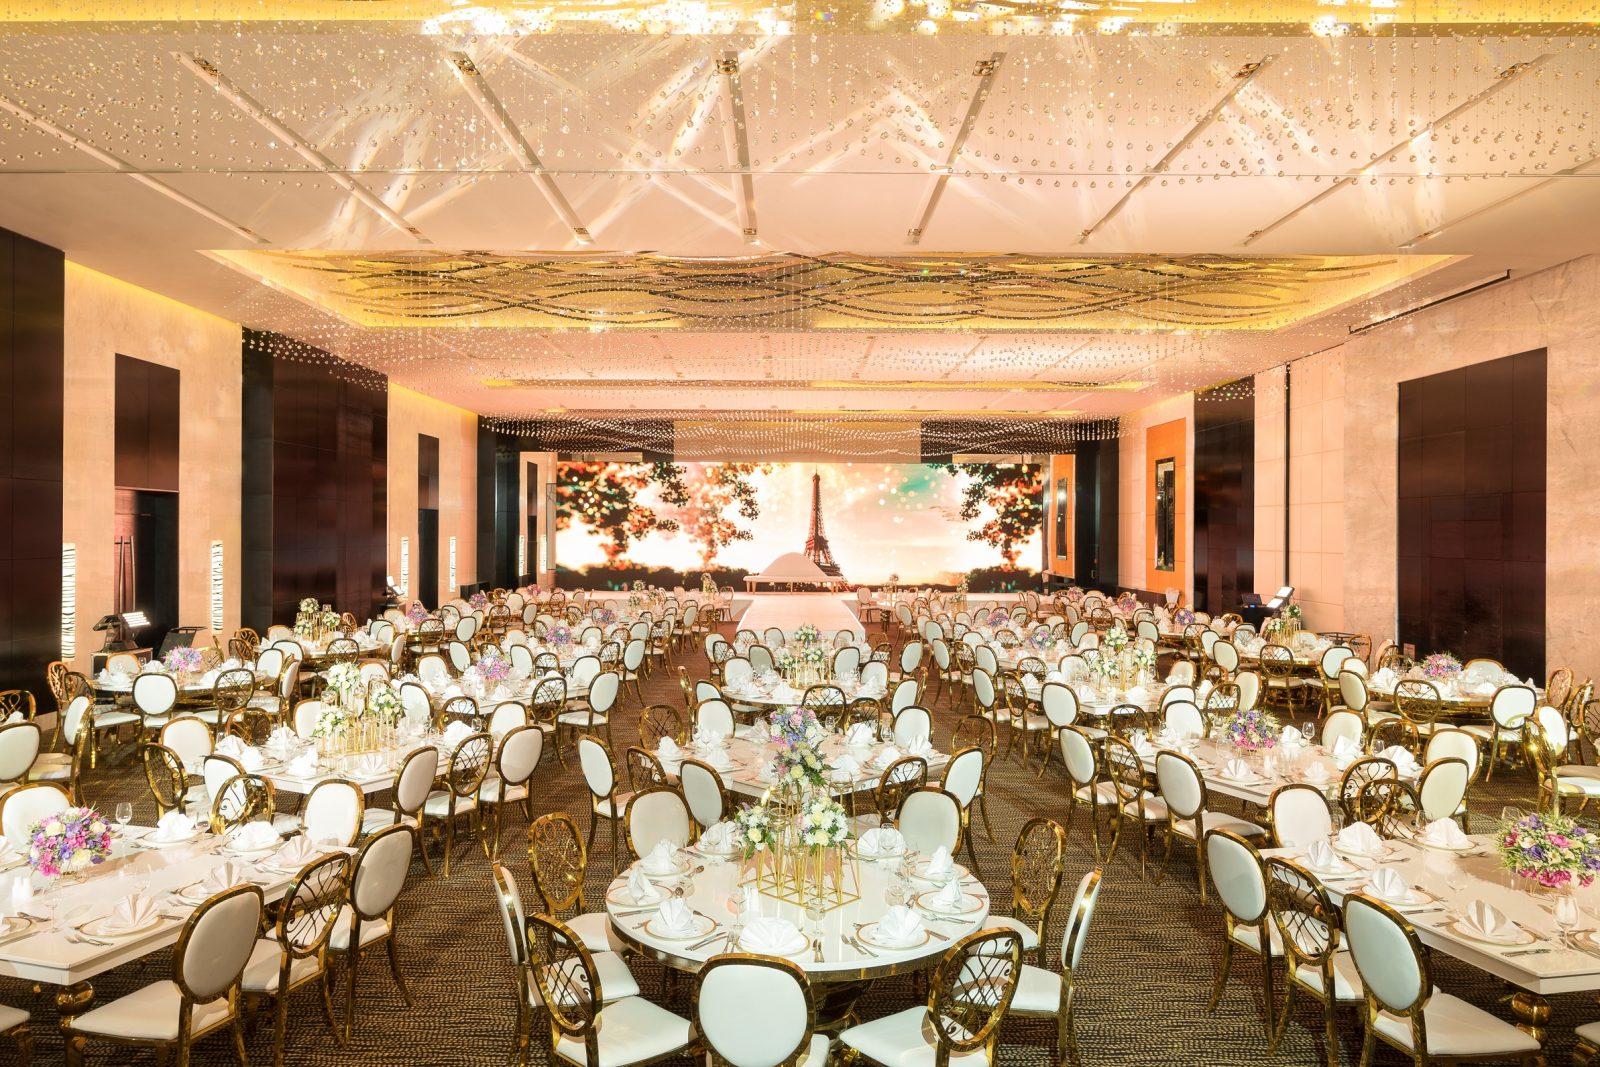 Sofitel Corniche Abu Dhabi Ballroom